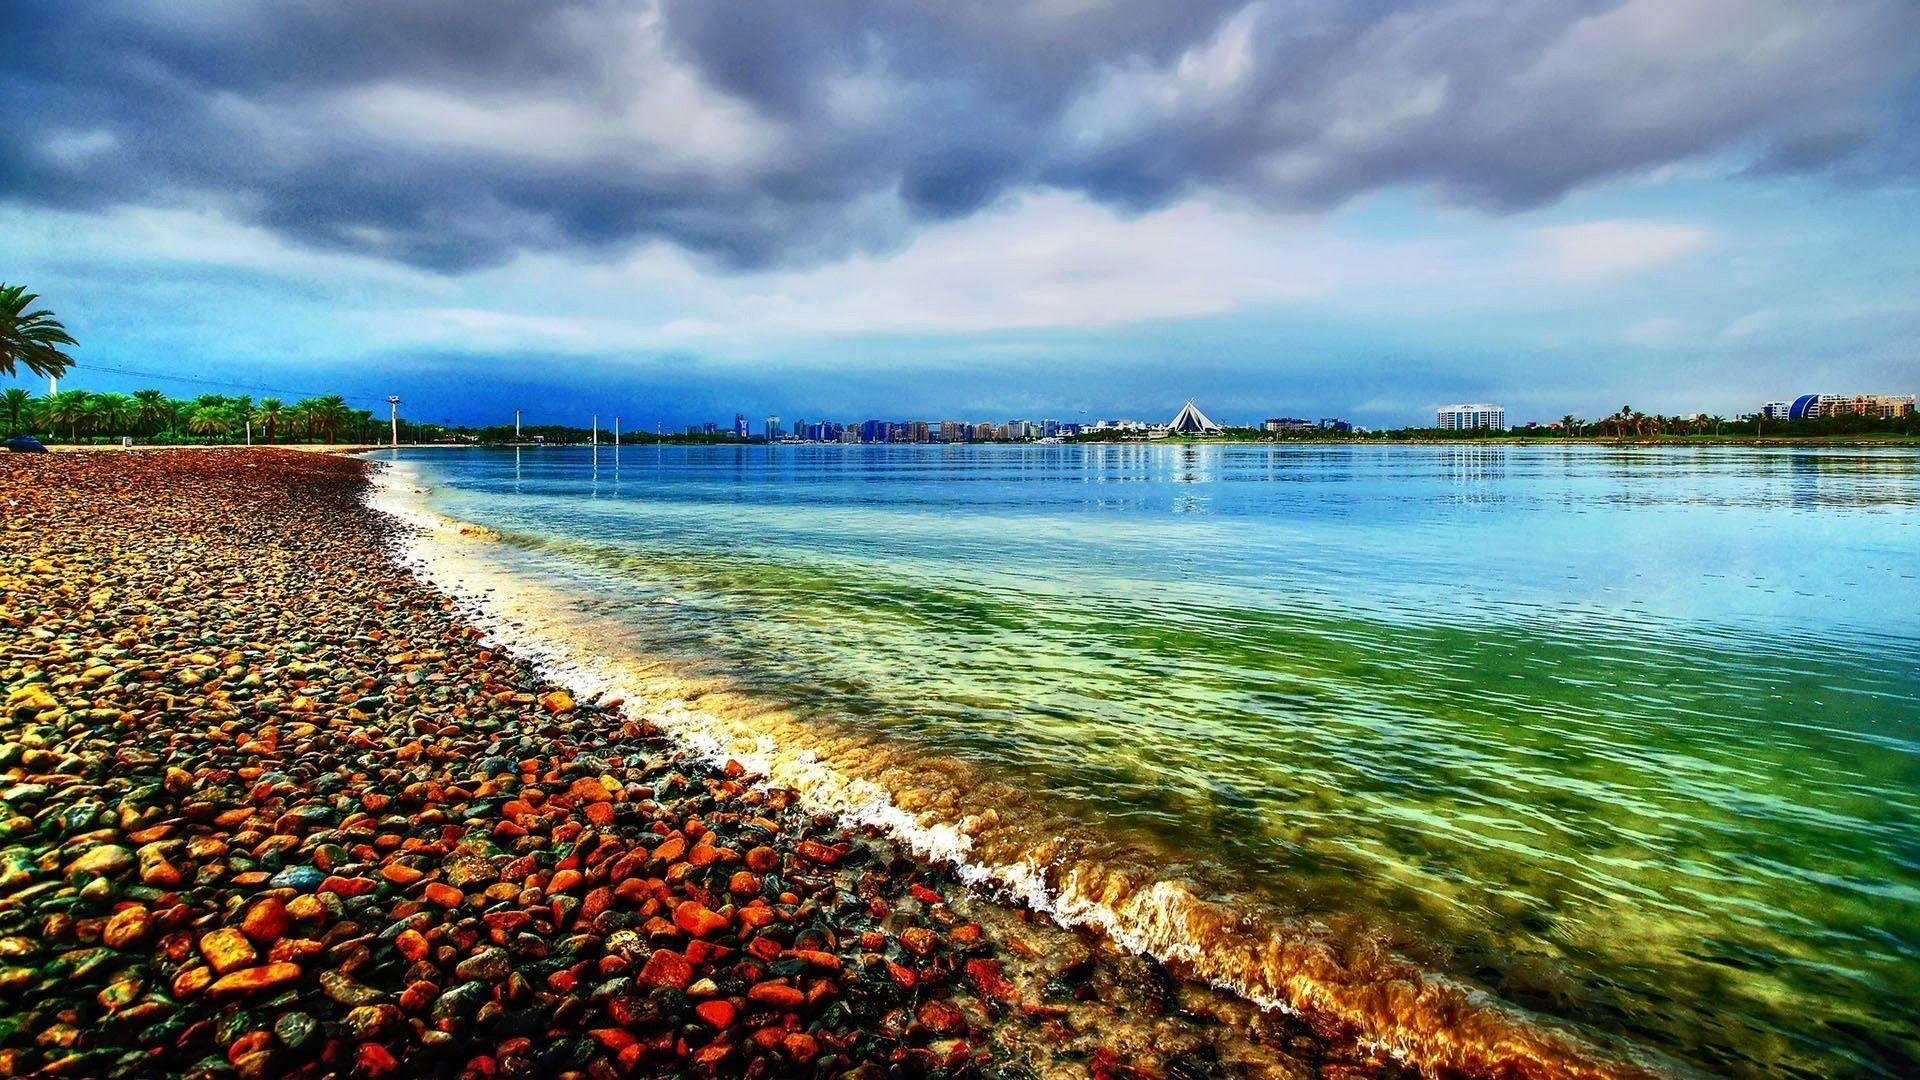 Northern Sea Hd Beach Wallpapers 1080p HD Pic wallpapers at .